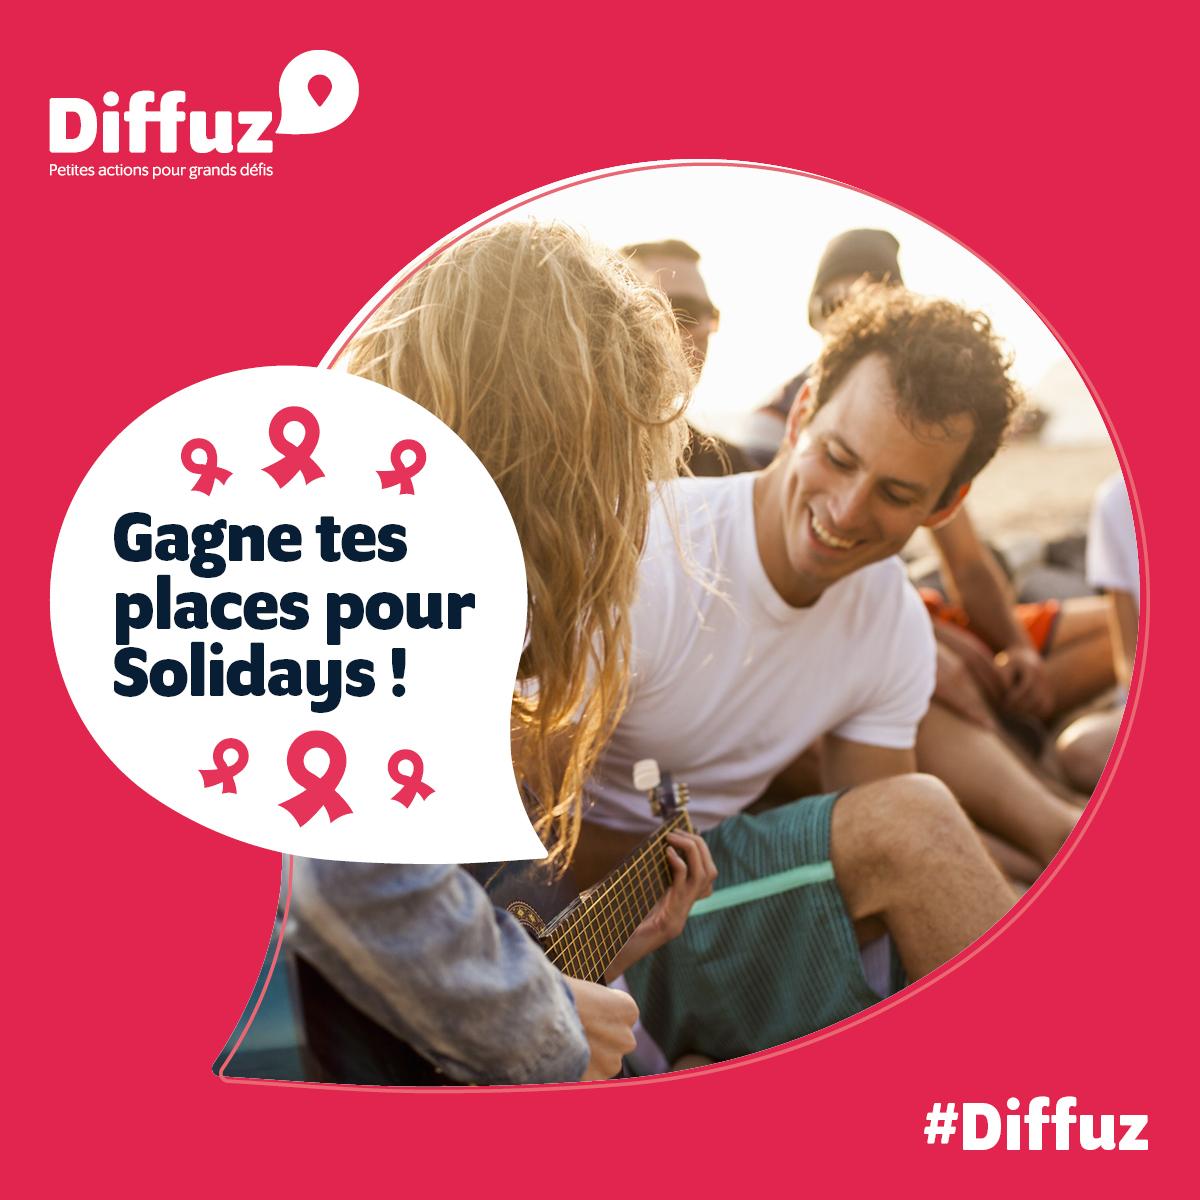 Diffuz Solidays JustMusic.fr